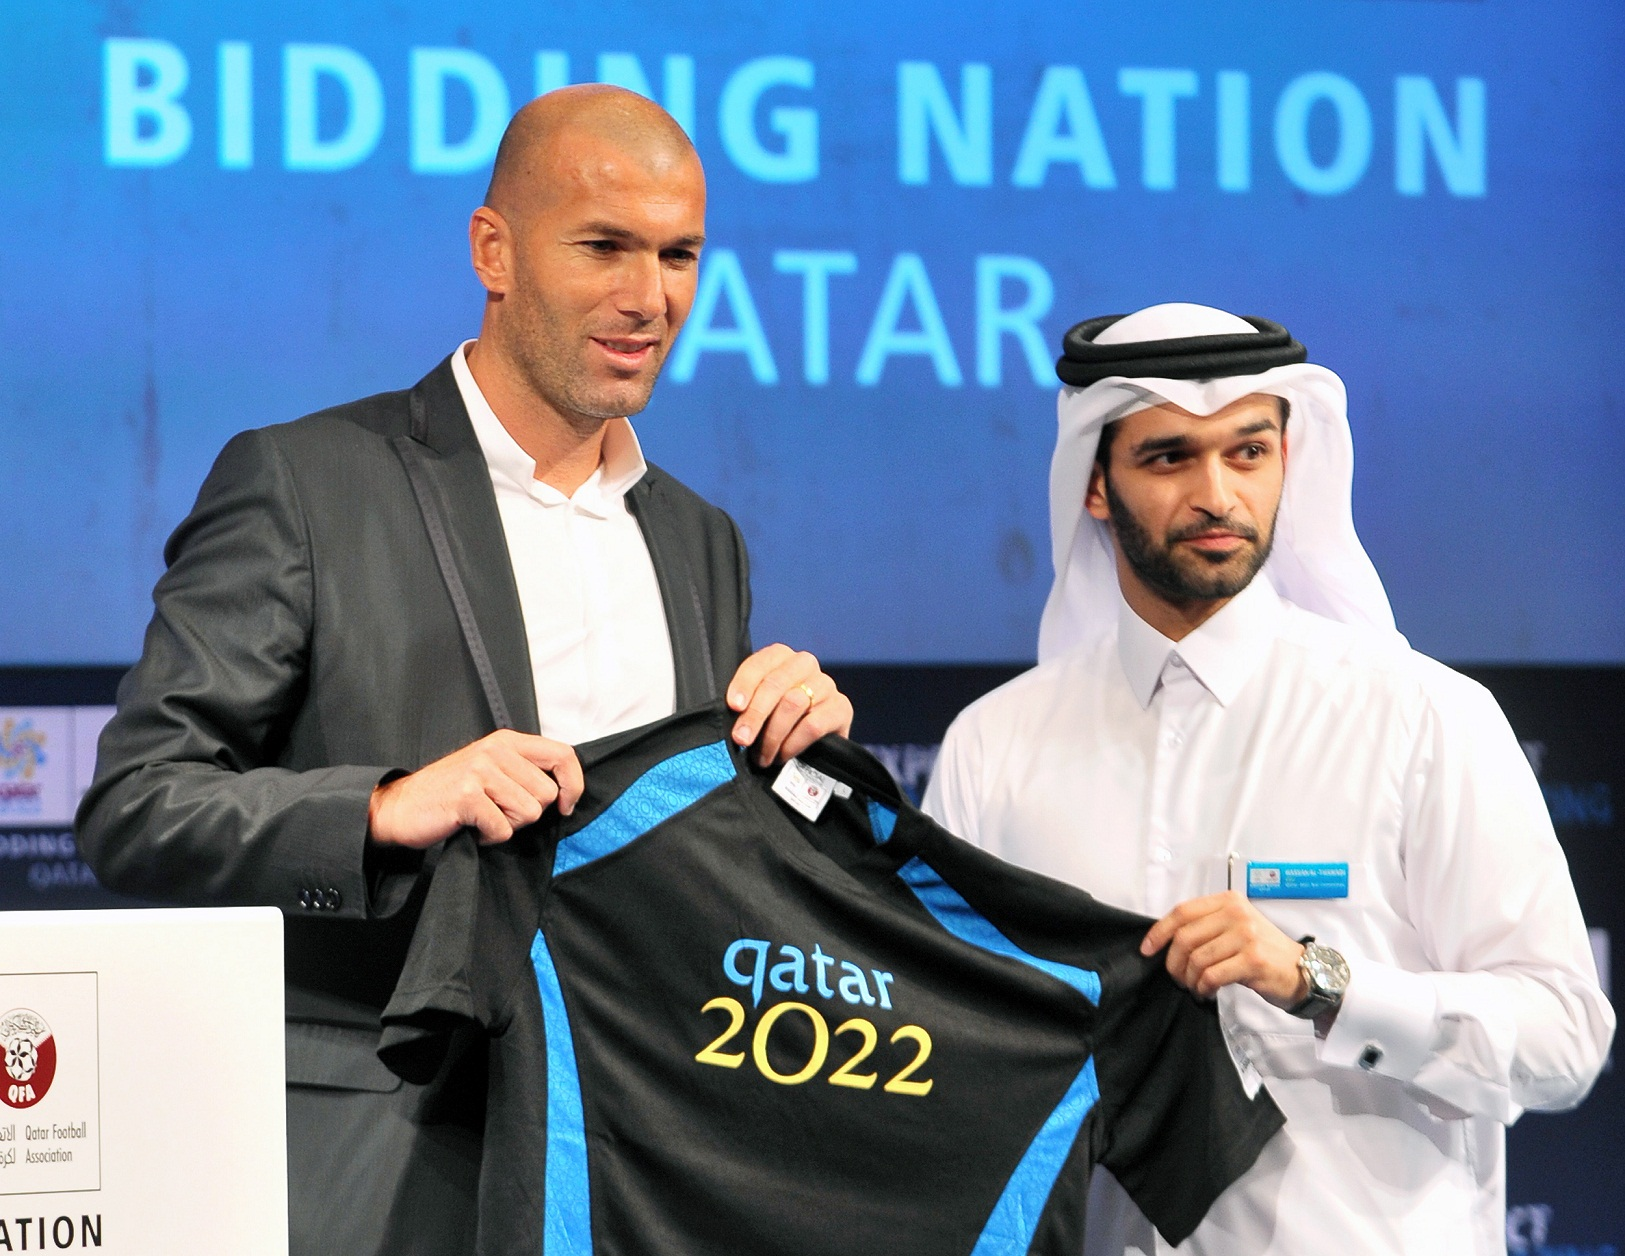 QATAR SOCCER FIFA WORLD CUP 2022